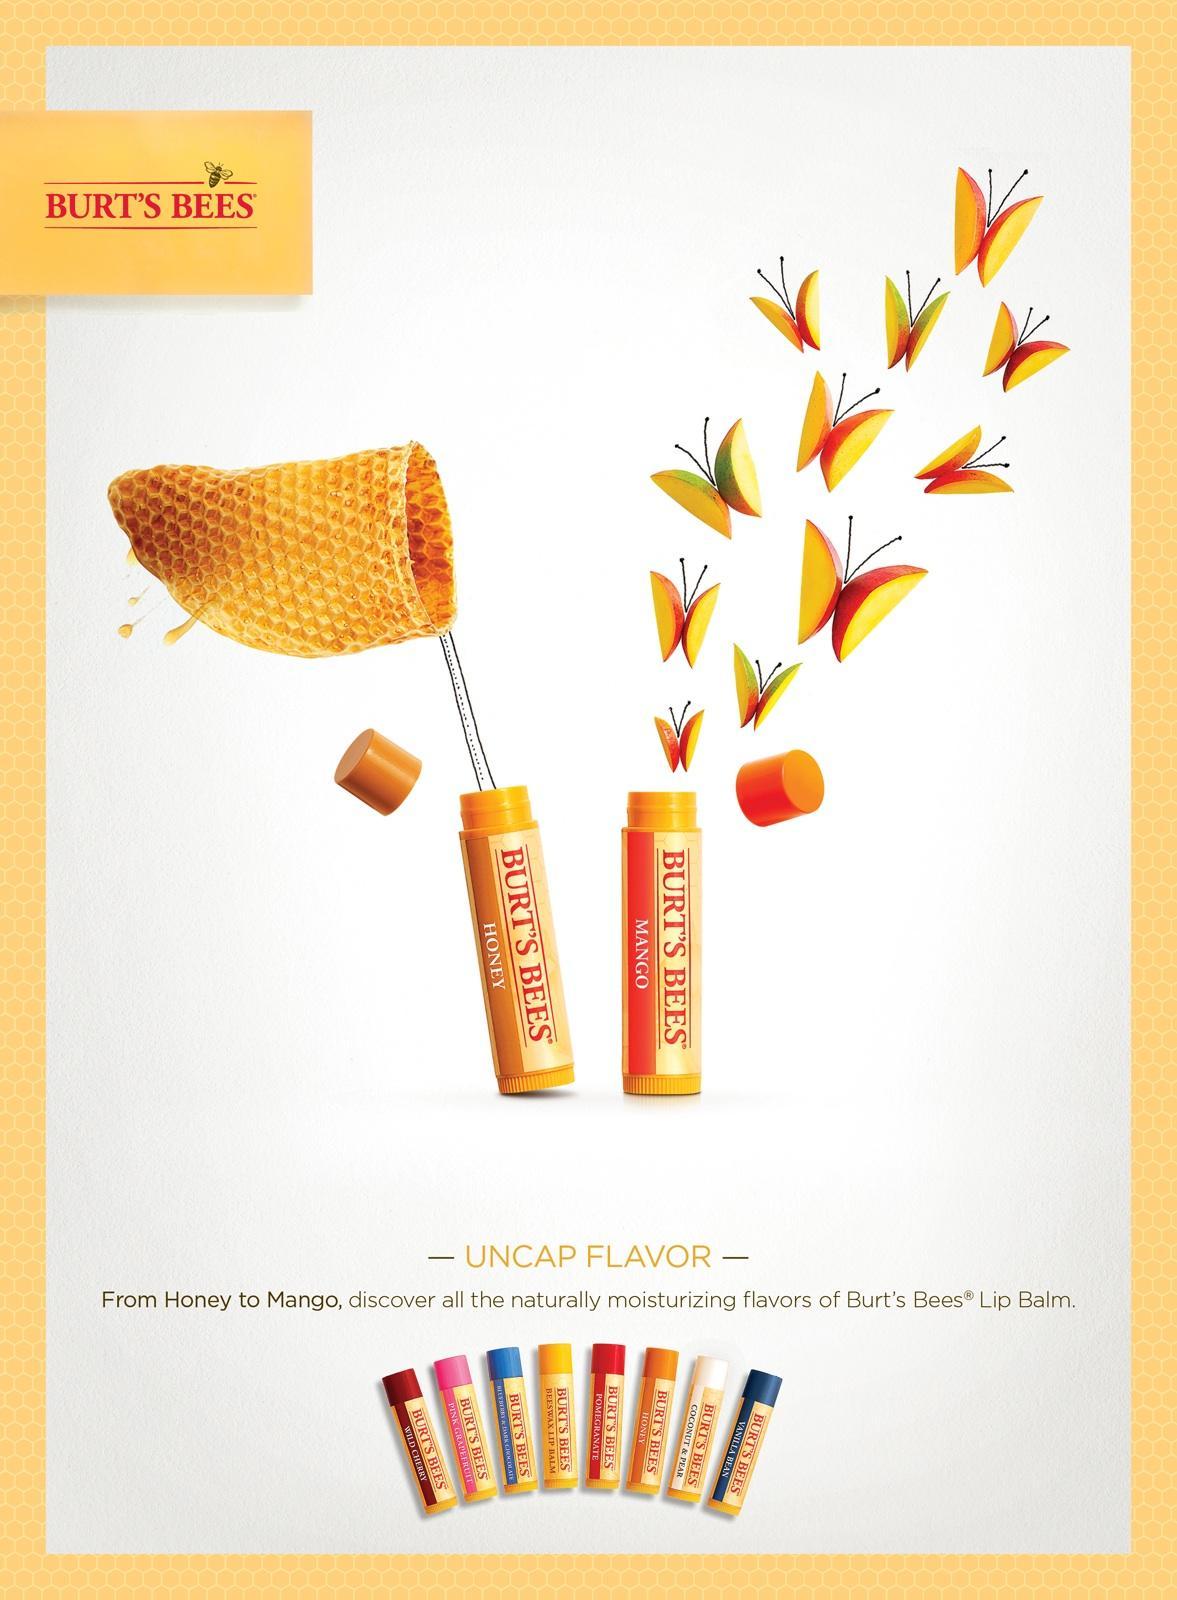 Burt's Bees Print Ad -  Uncap Flavor, 3